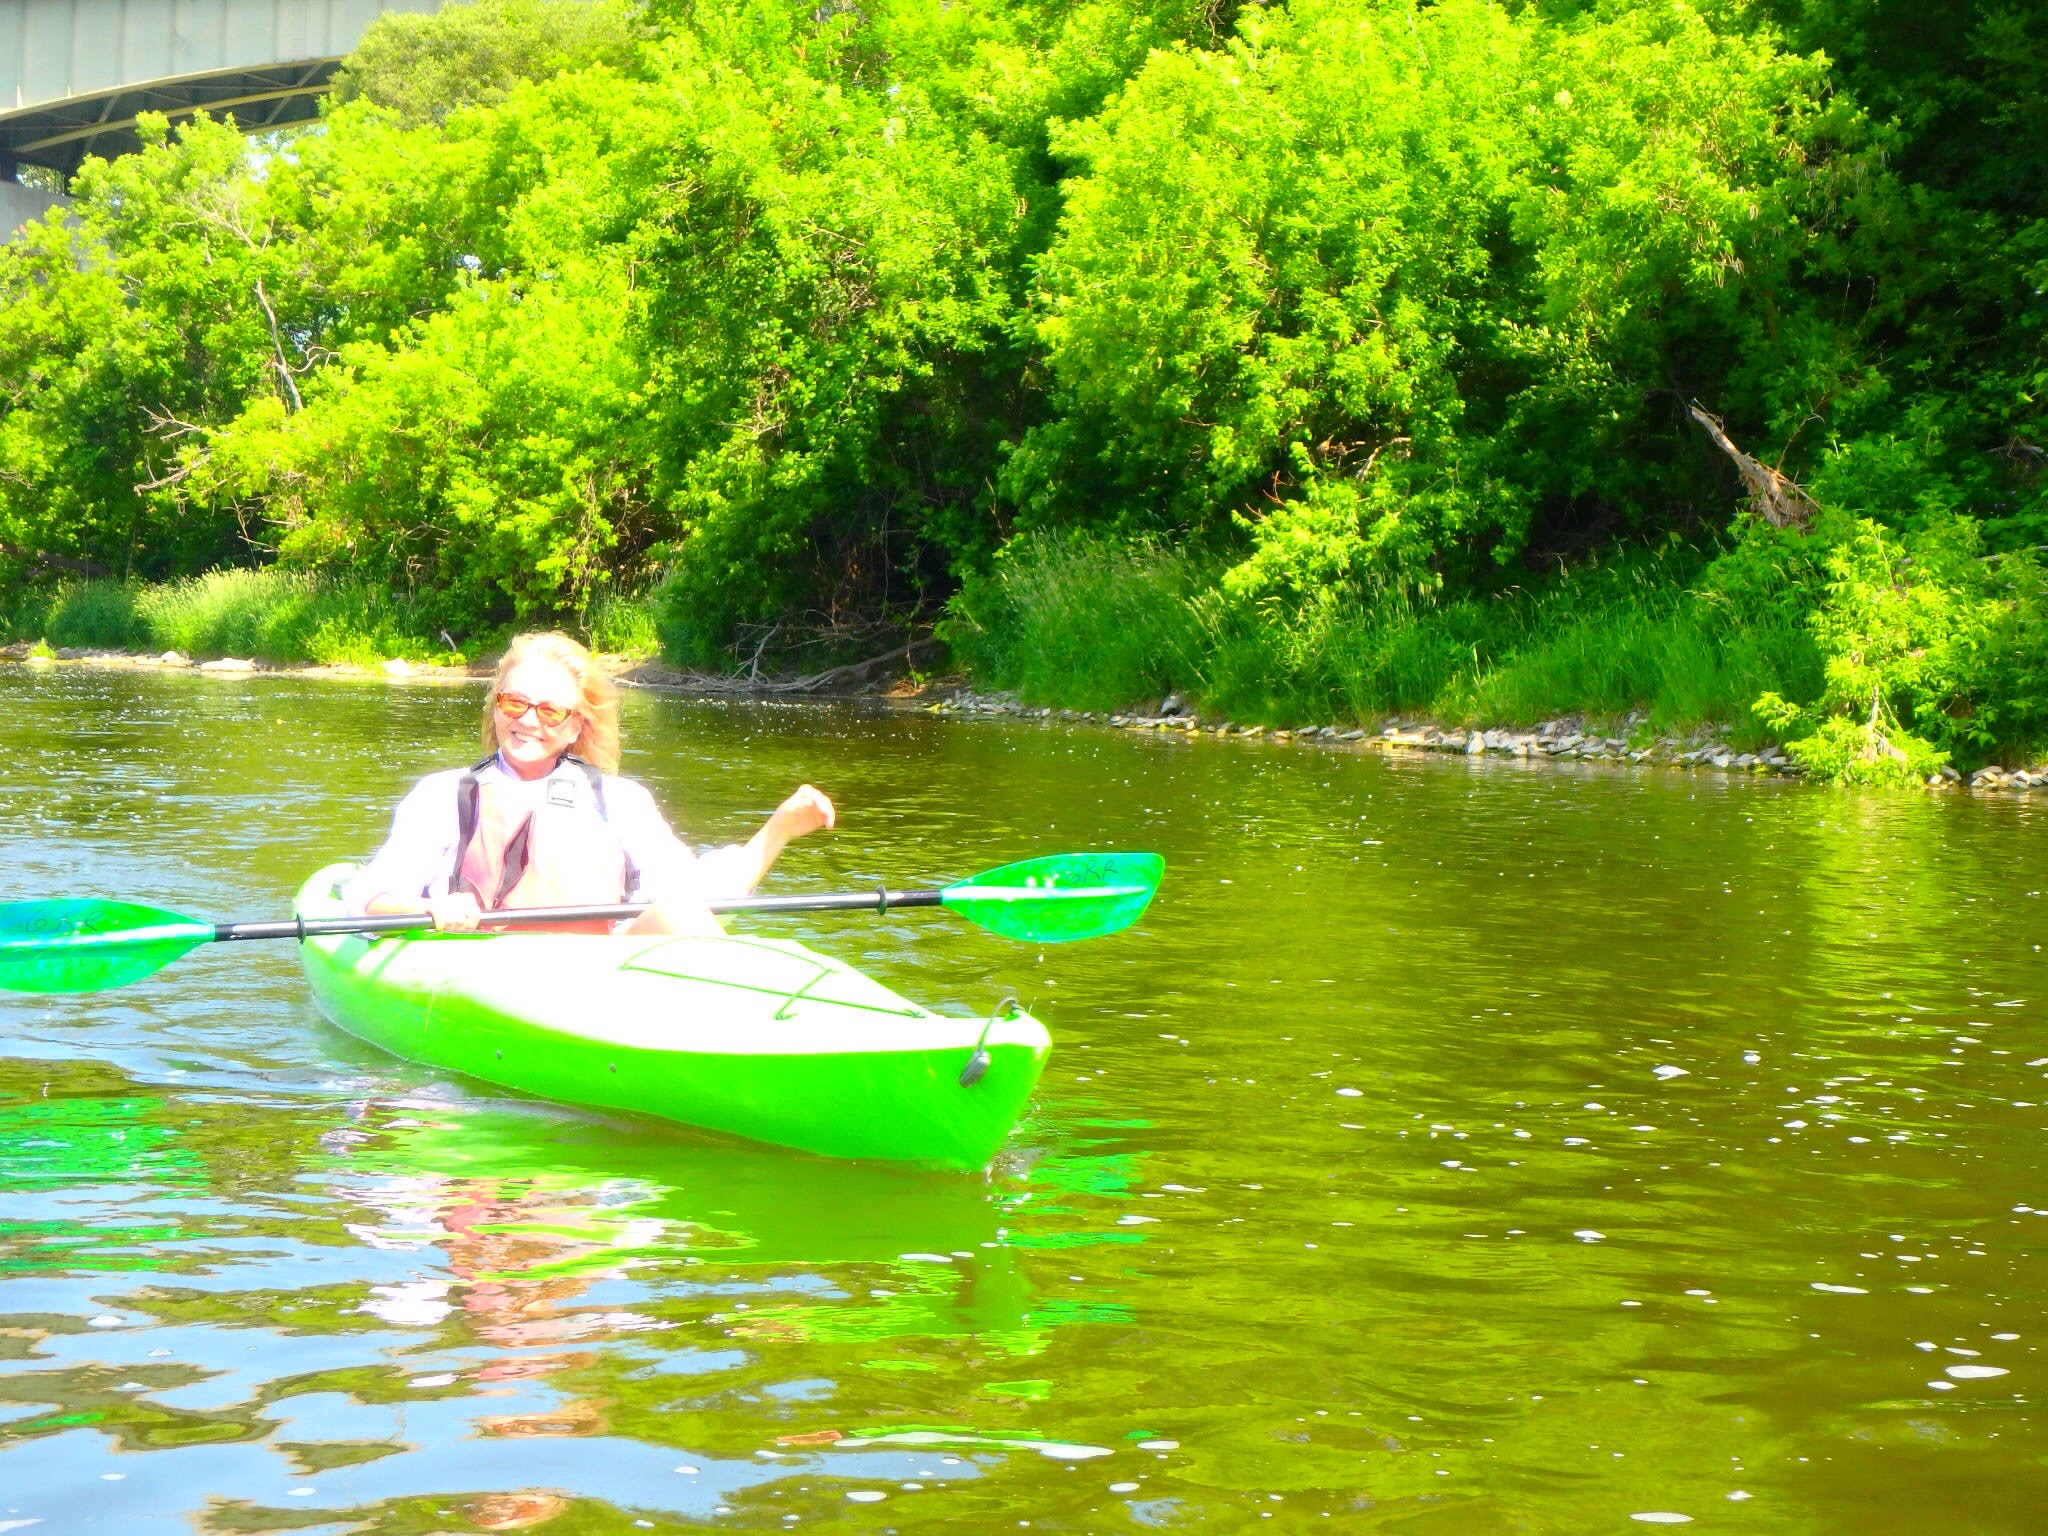 Kayaking Yoga Meditation - Solstice - Jun 21 2018-22